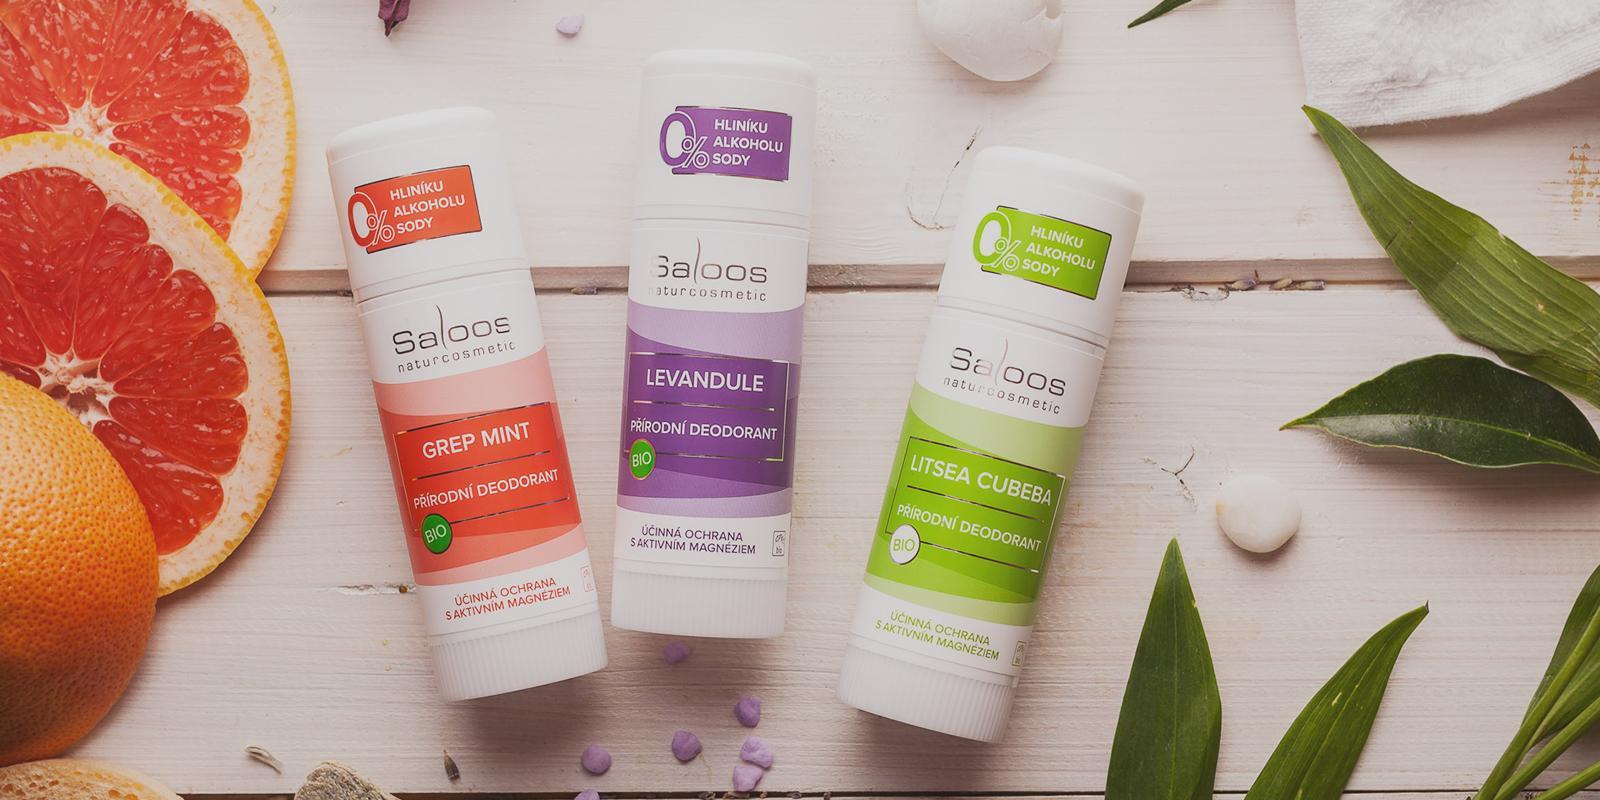 Saloos přírodní deodorant